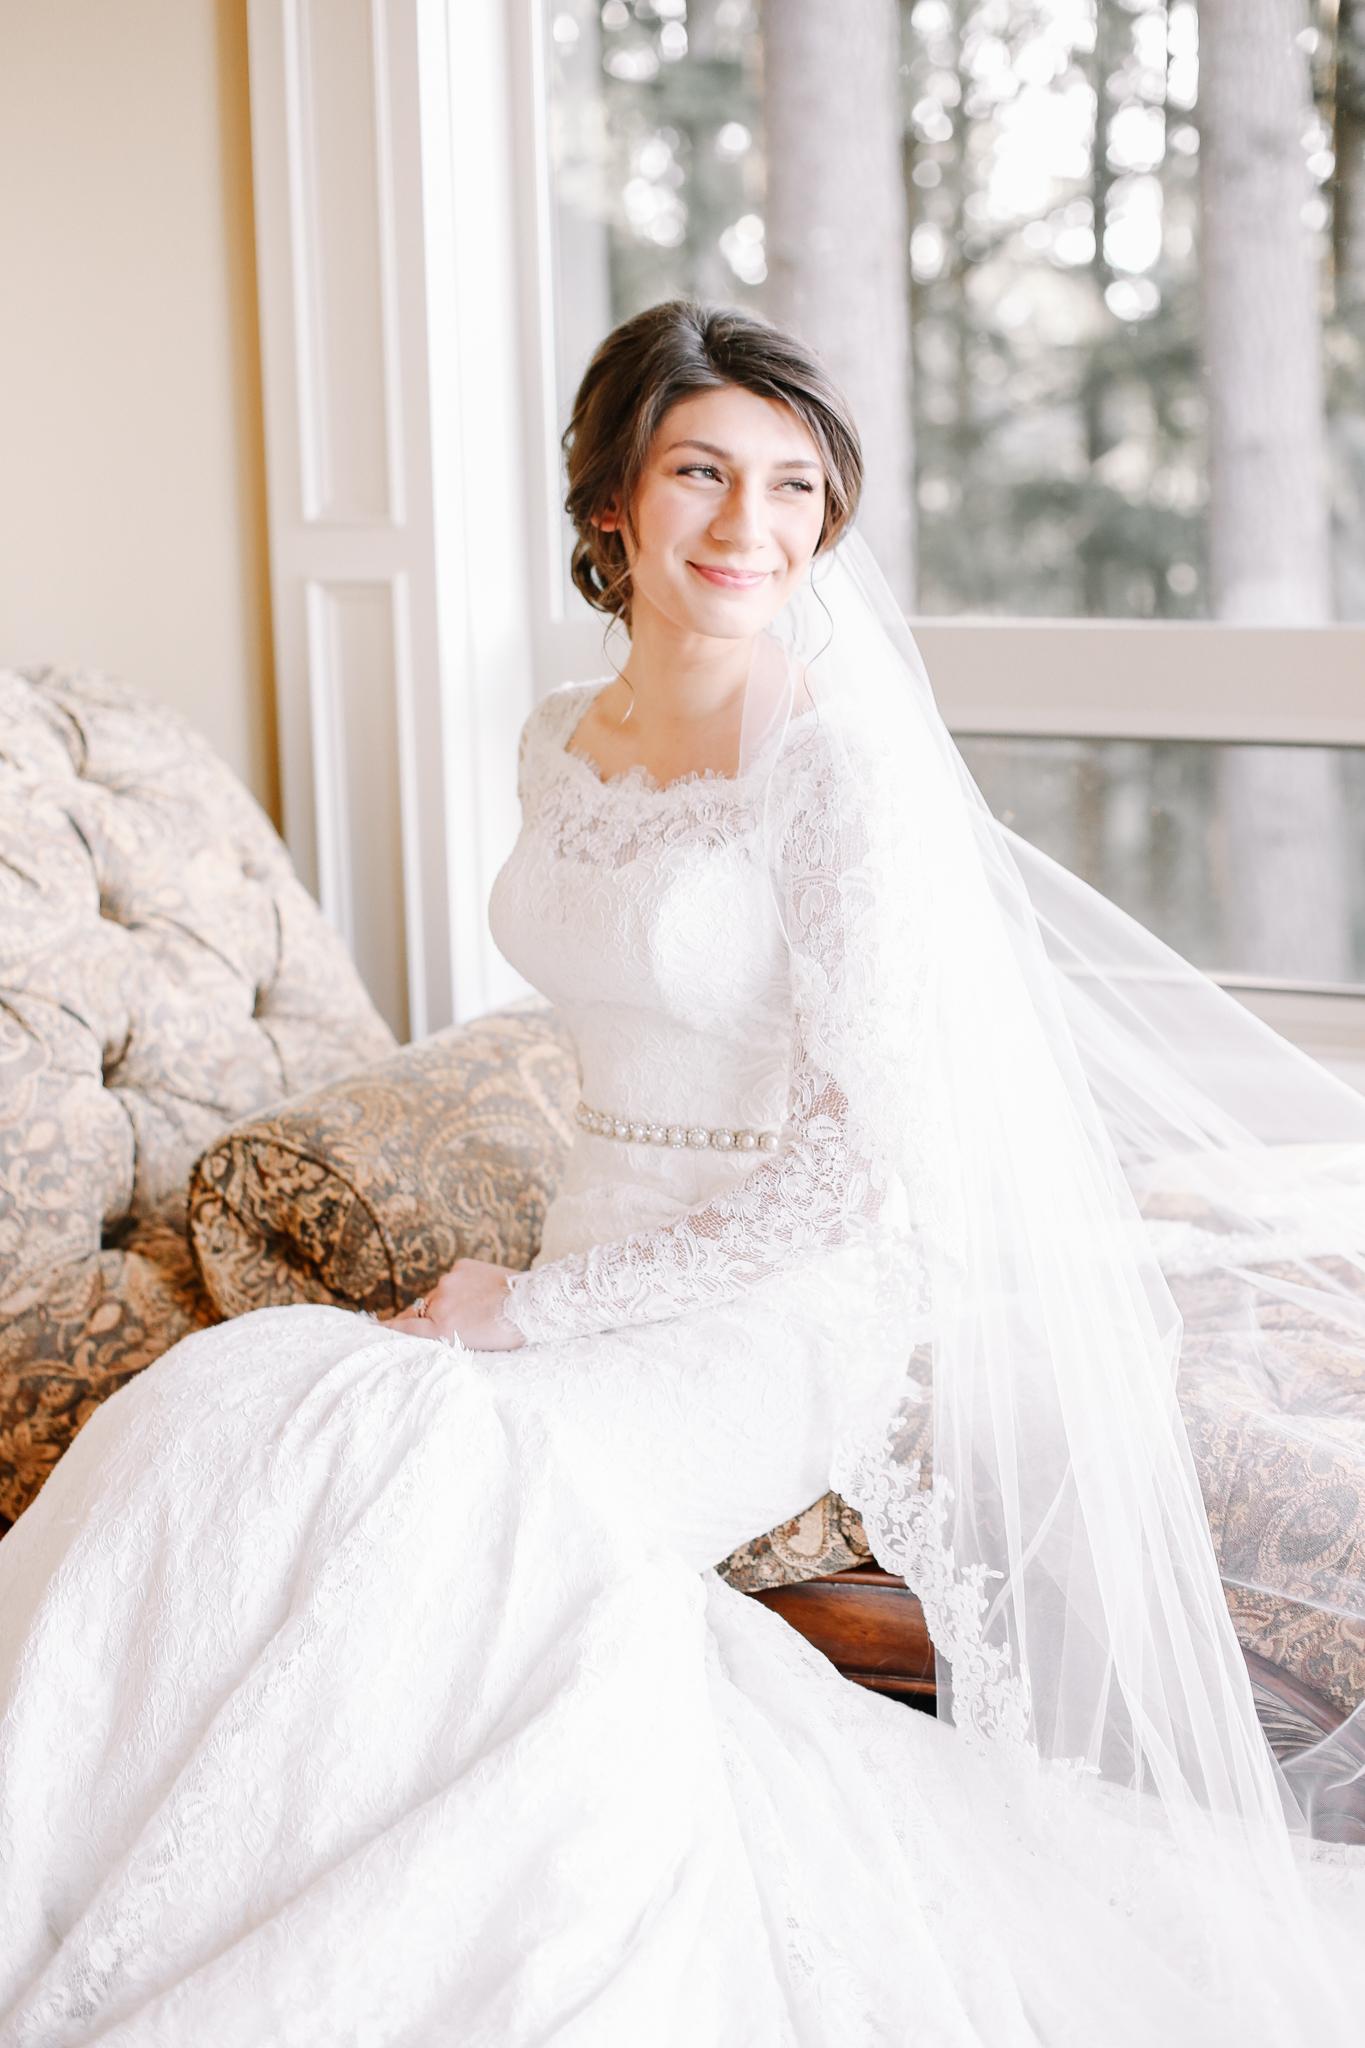 Manu and Laura - Portland Wedding Photographer - 8.jpg